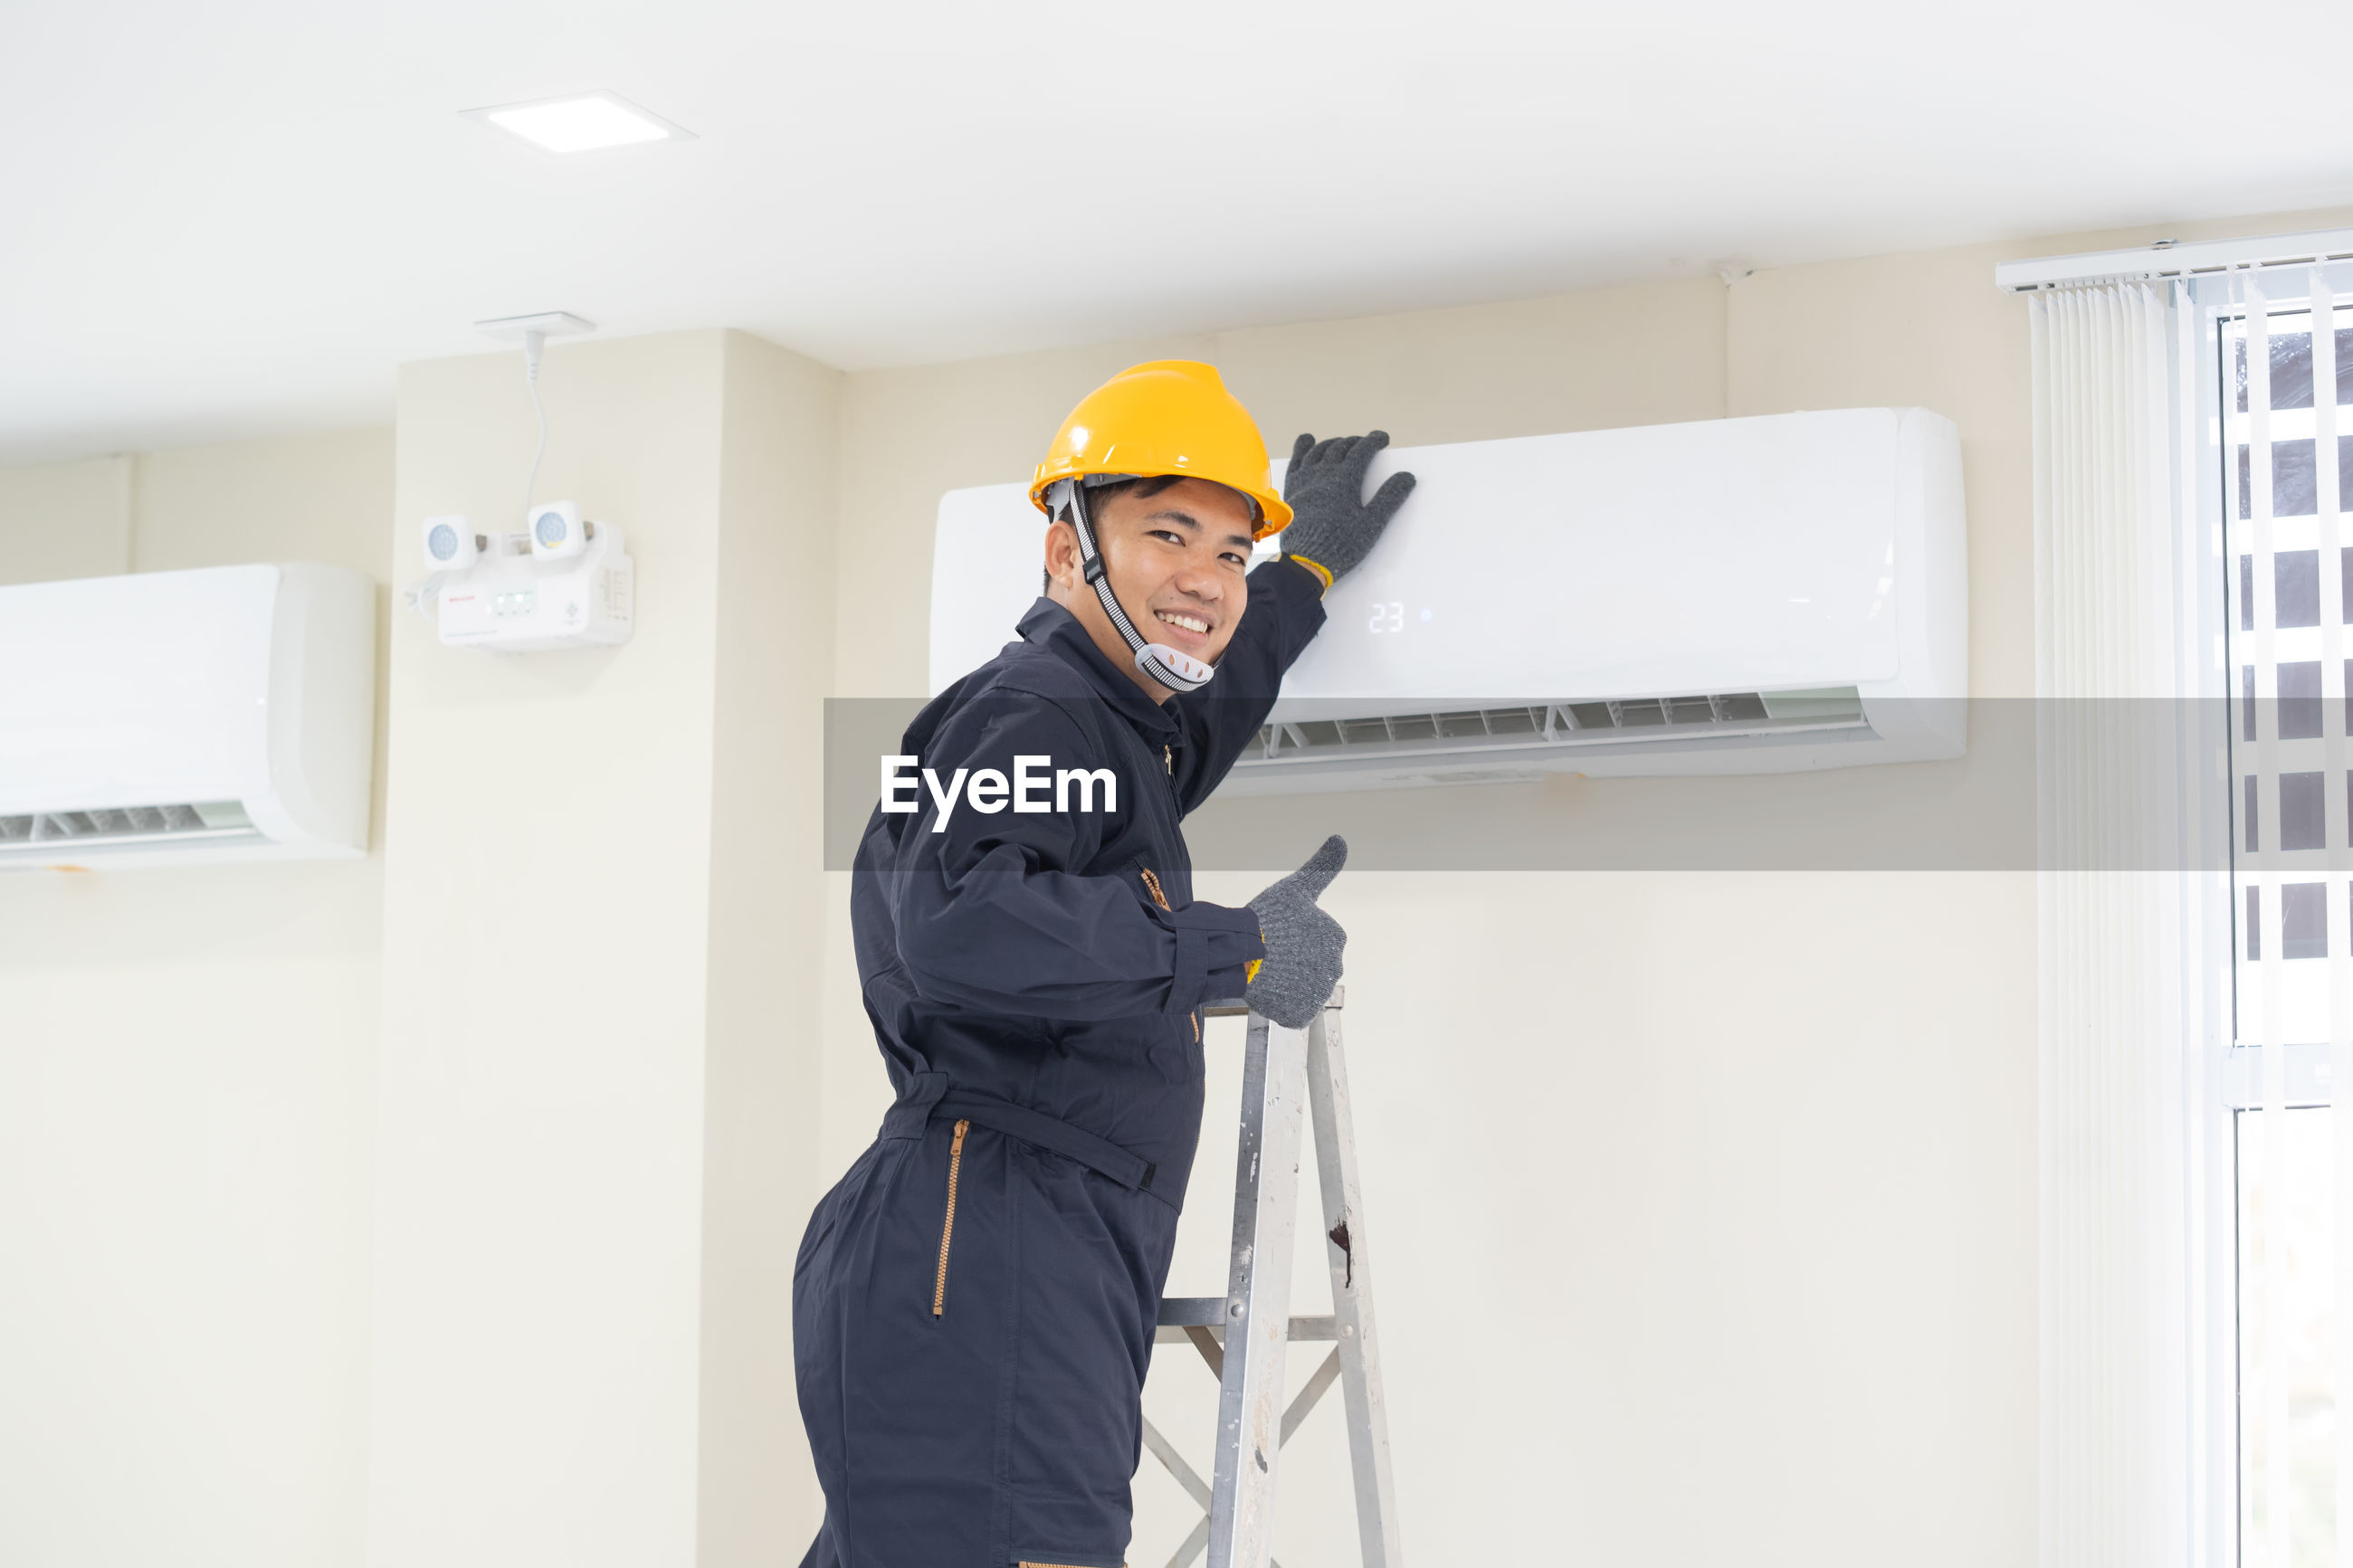 Portrait of man repairing air conditioner at home